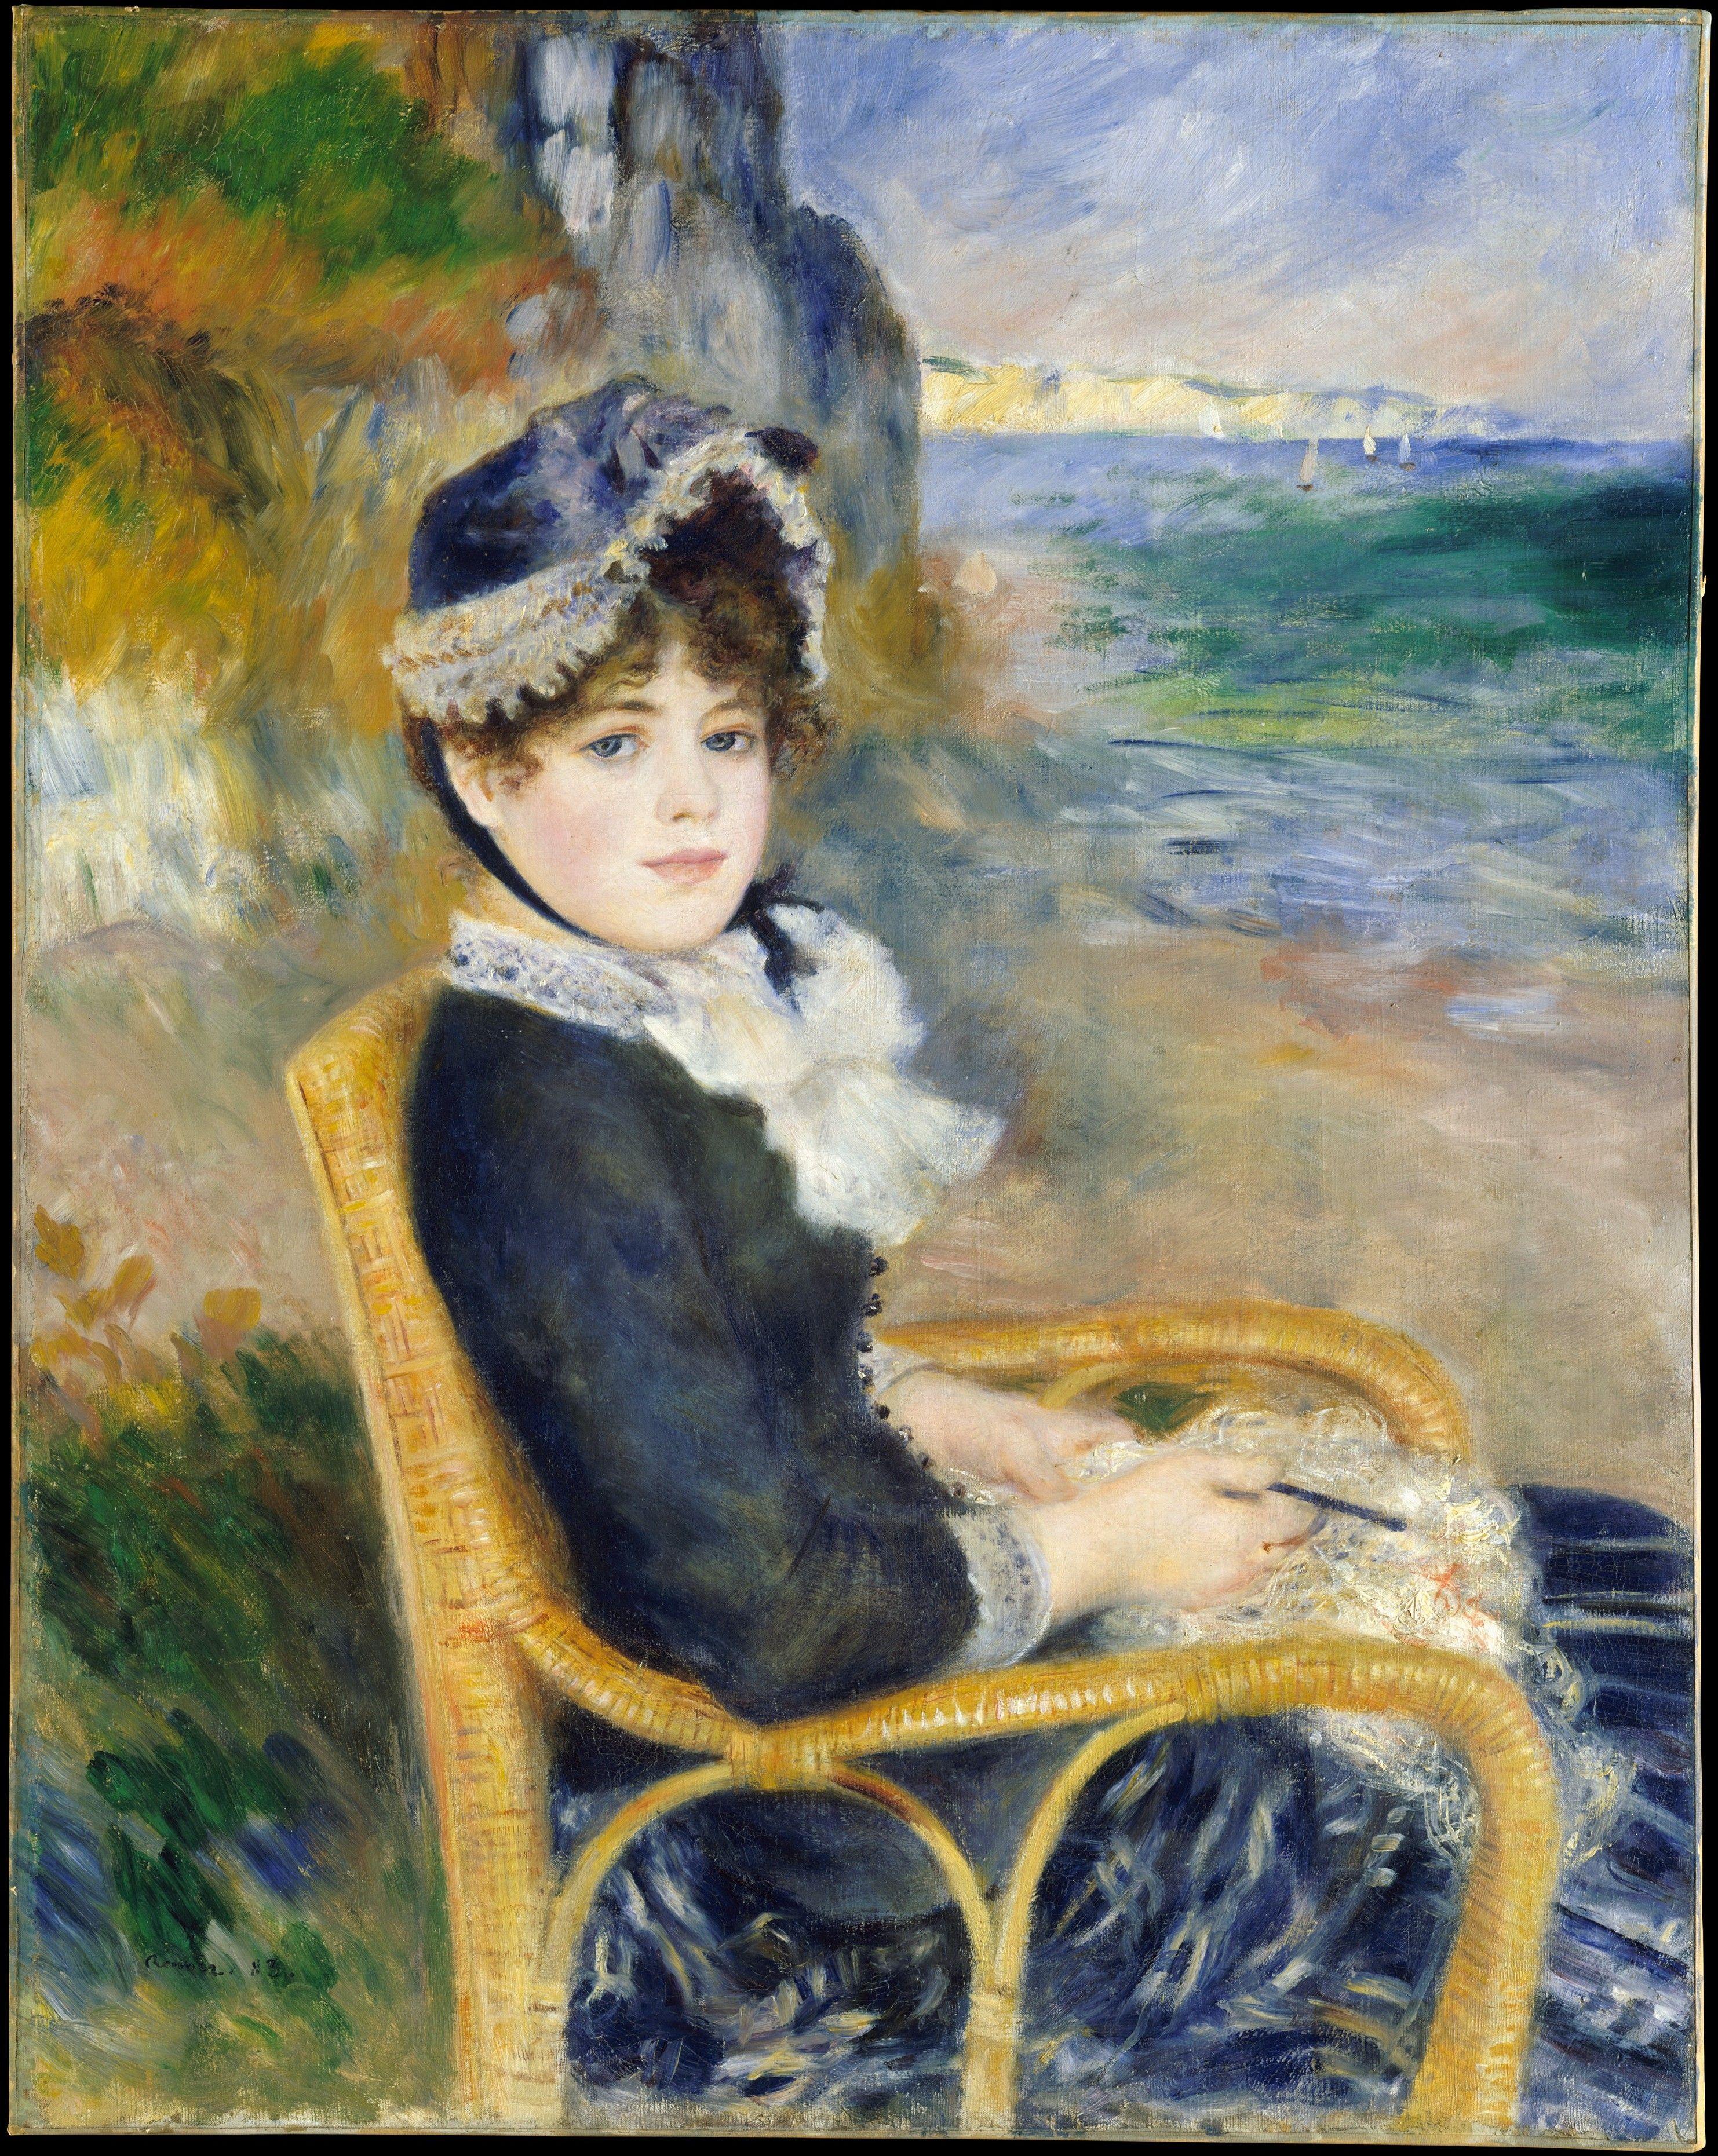 By the Seashore 1883 Renoir